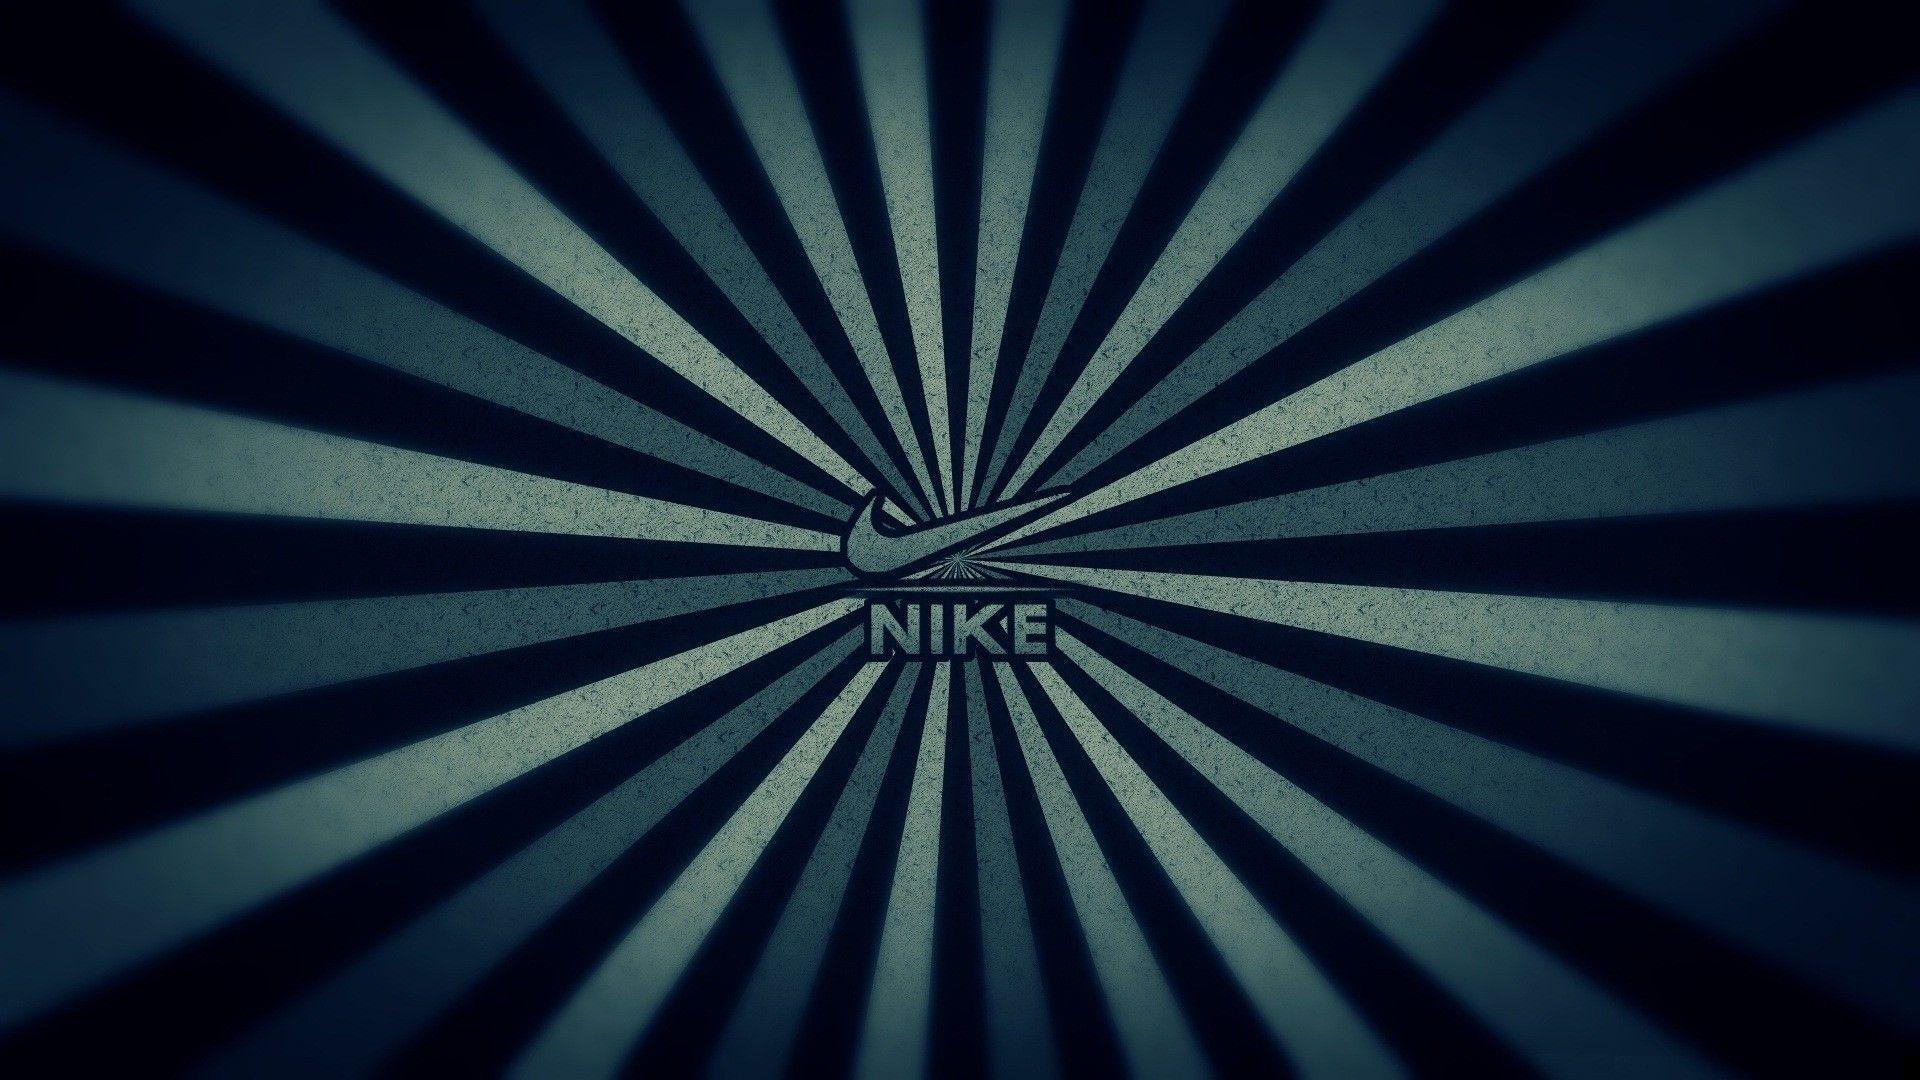 <b>Nike Wallpapers</b> Full HD | PixelsTalk.Net